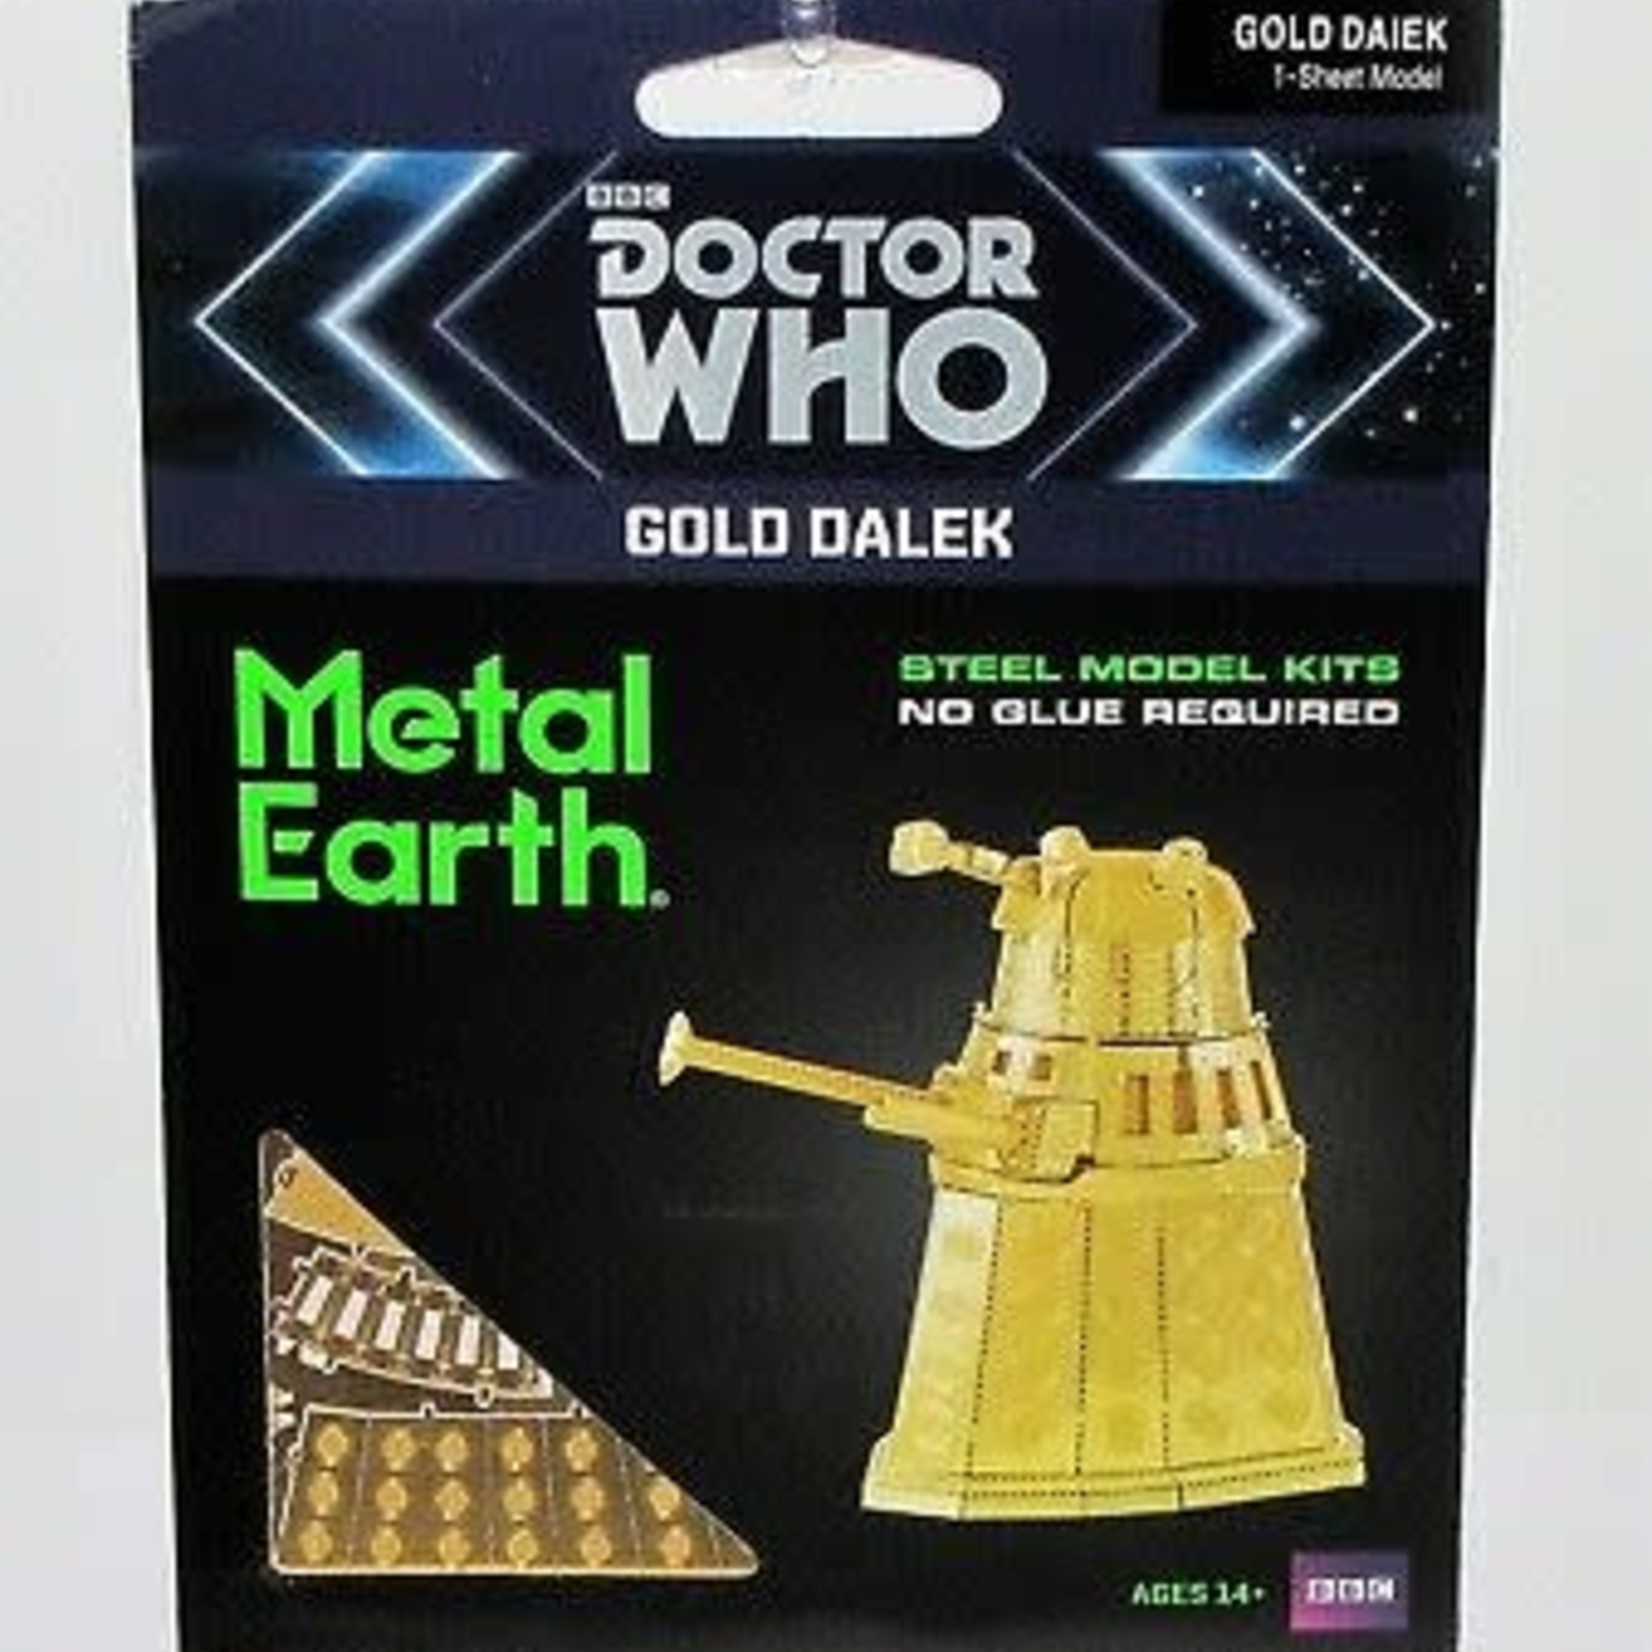 Metal Earth: Doctor Who Gold Dalek